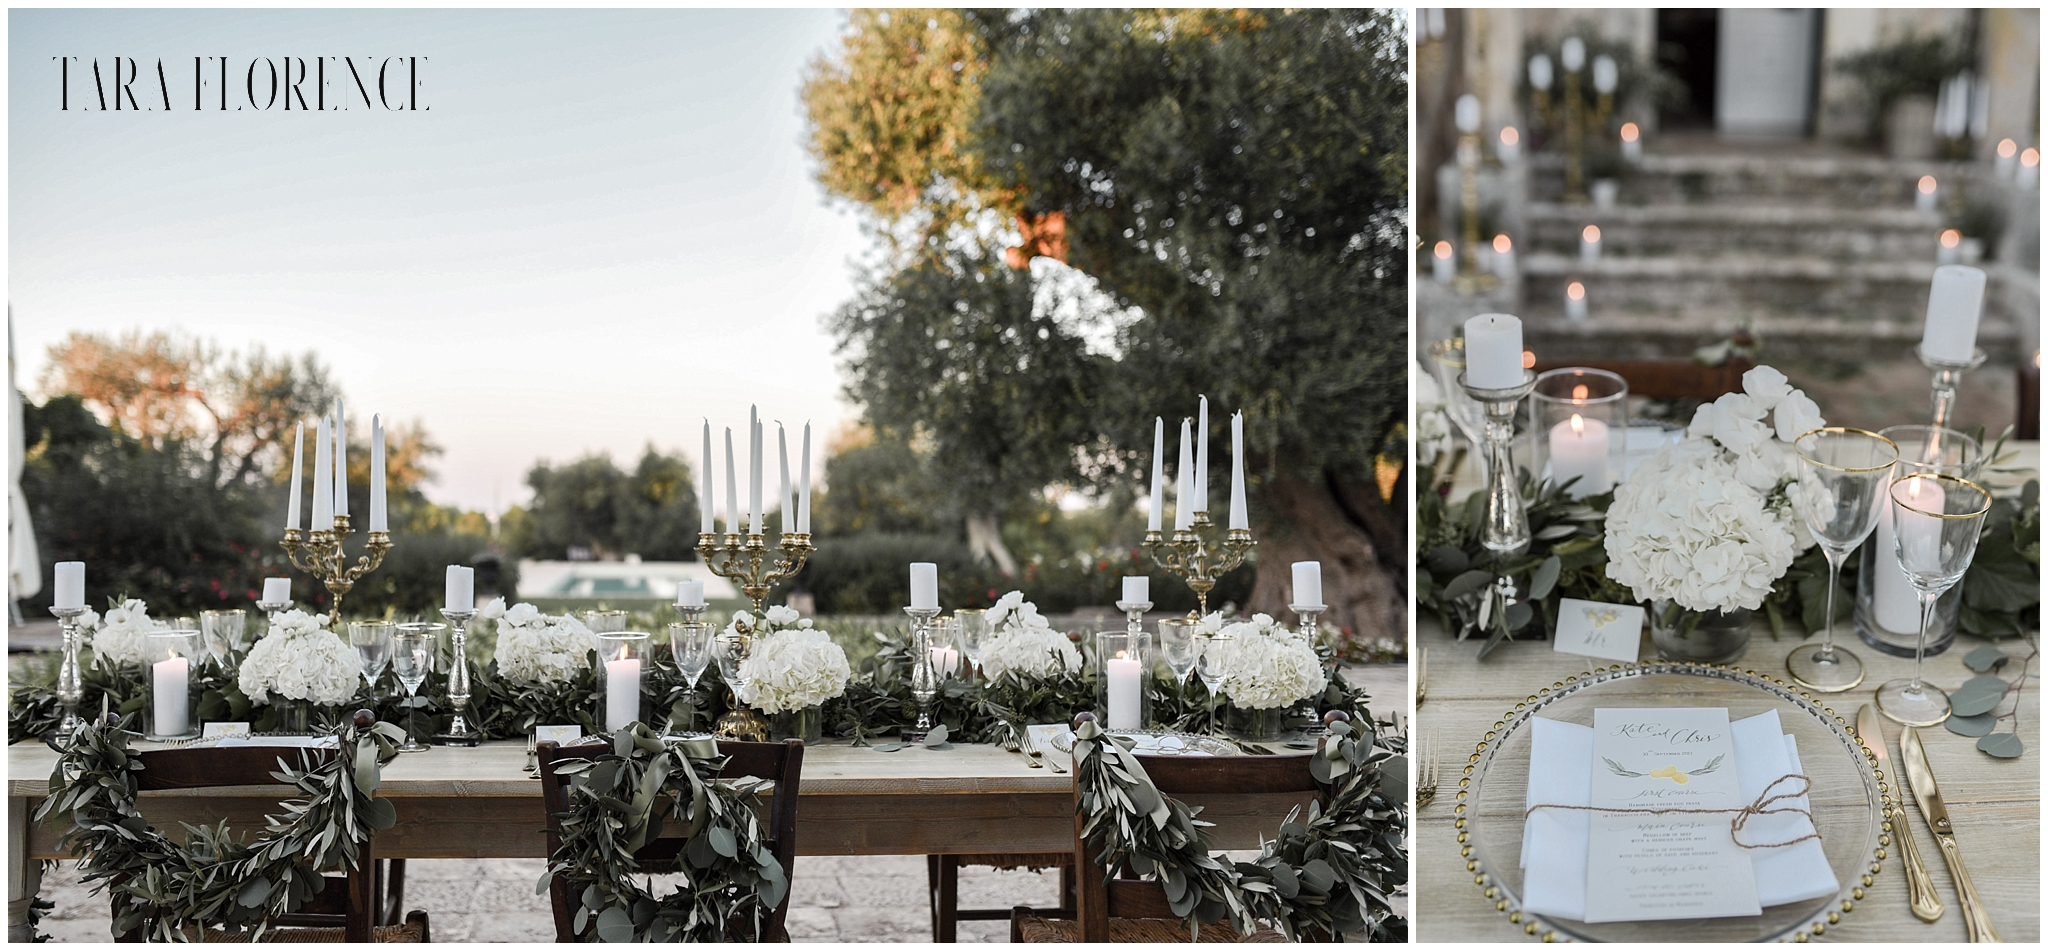 Puglia-Tara-Florence-Bridal-Editorial-171_WEB.jpg